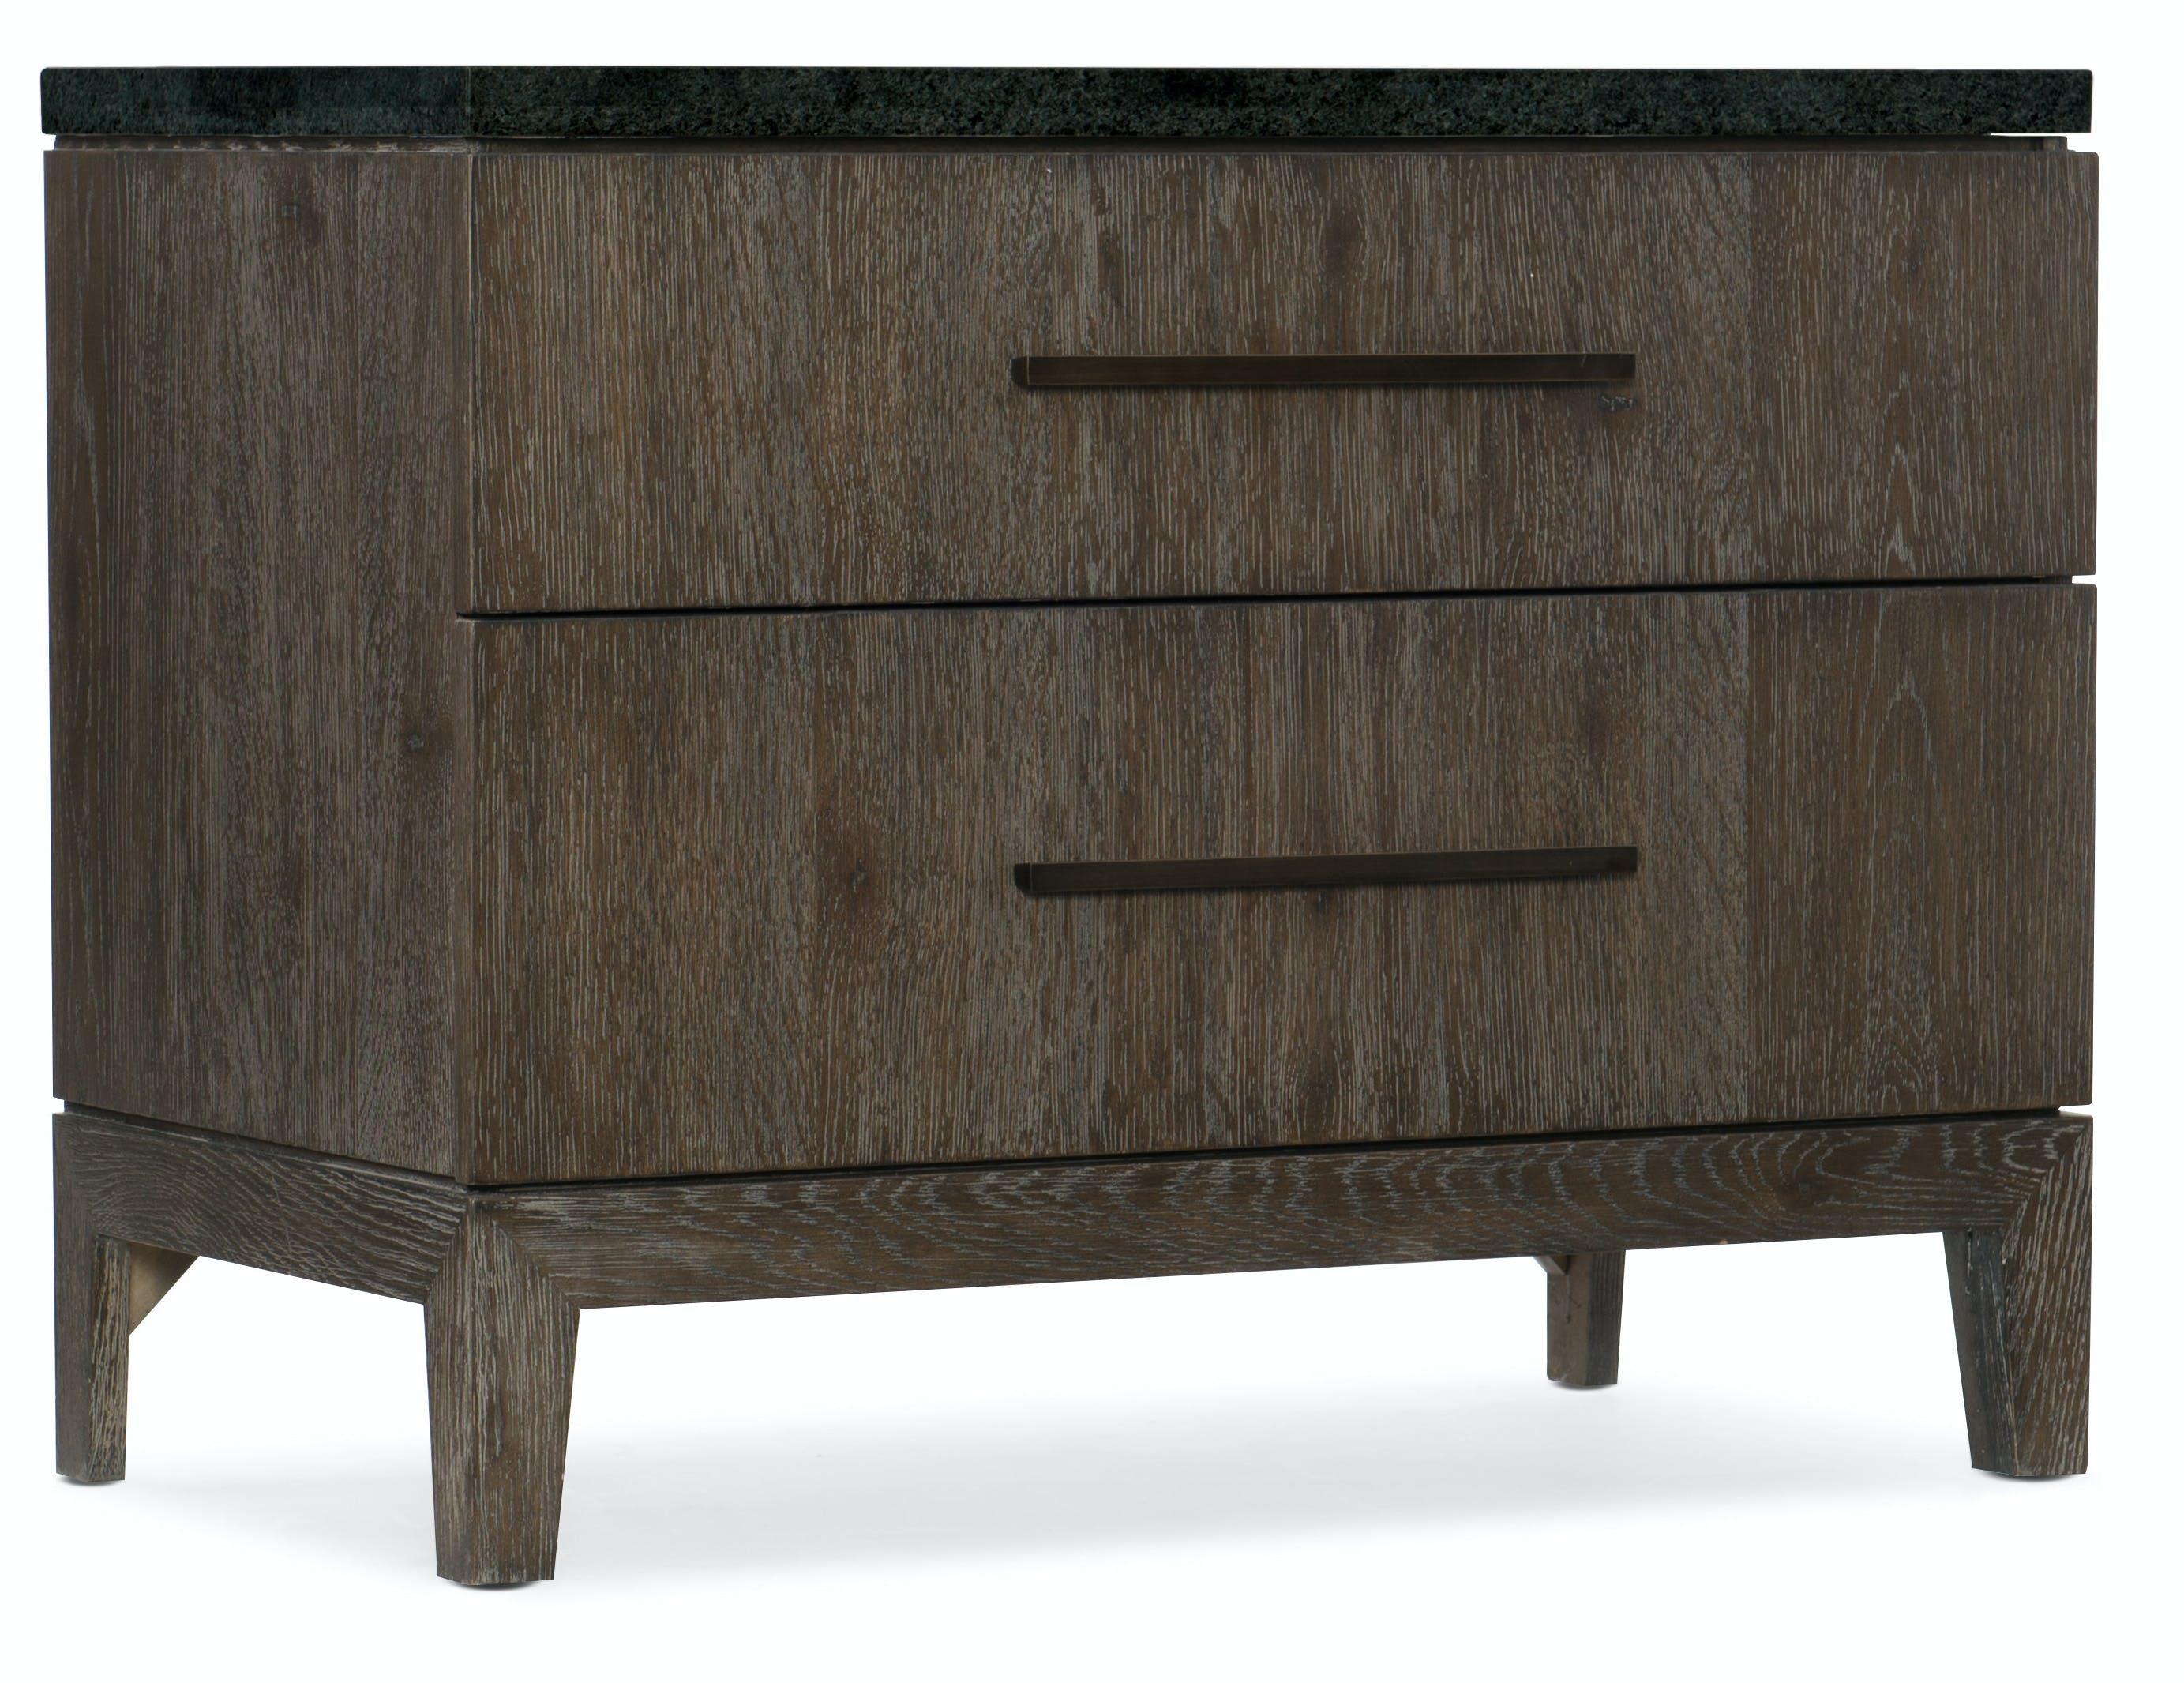 Hooker Furniture Bedroom Miramar Aventura San Marcos Stone